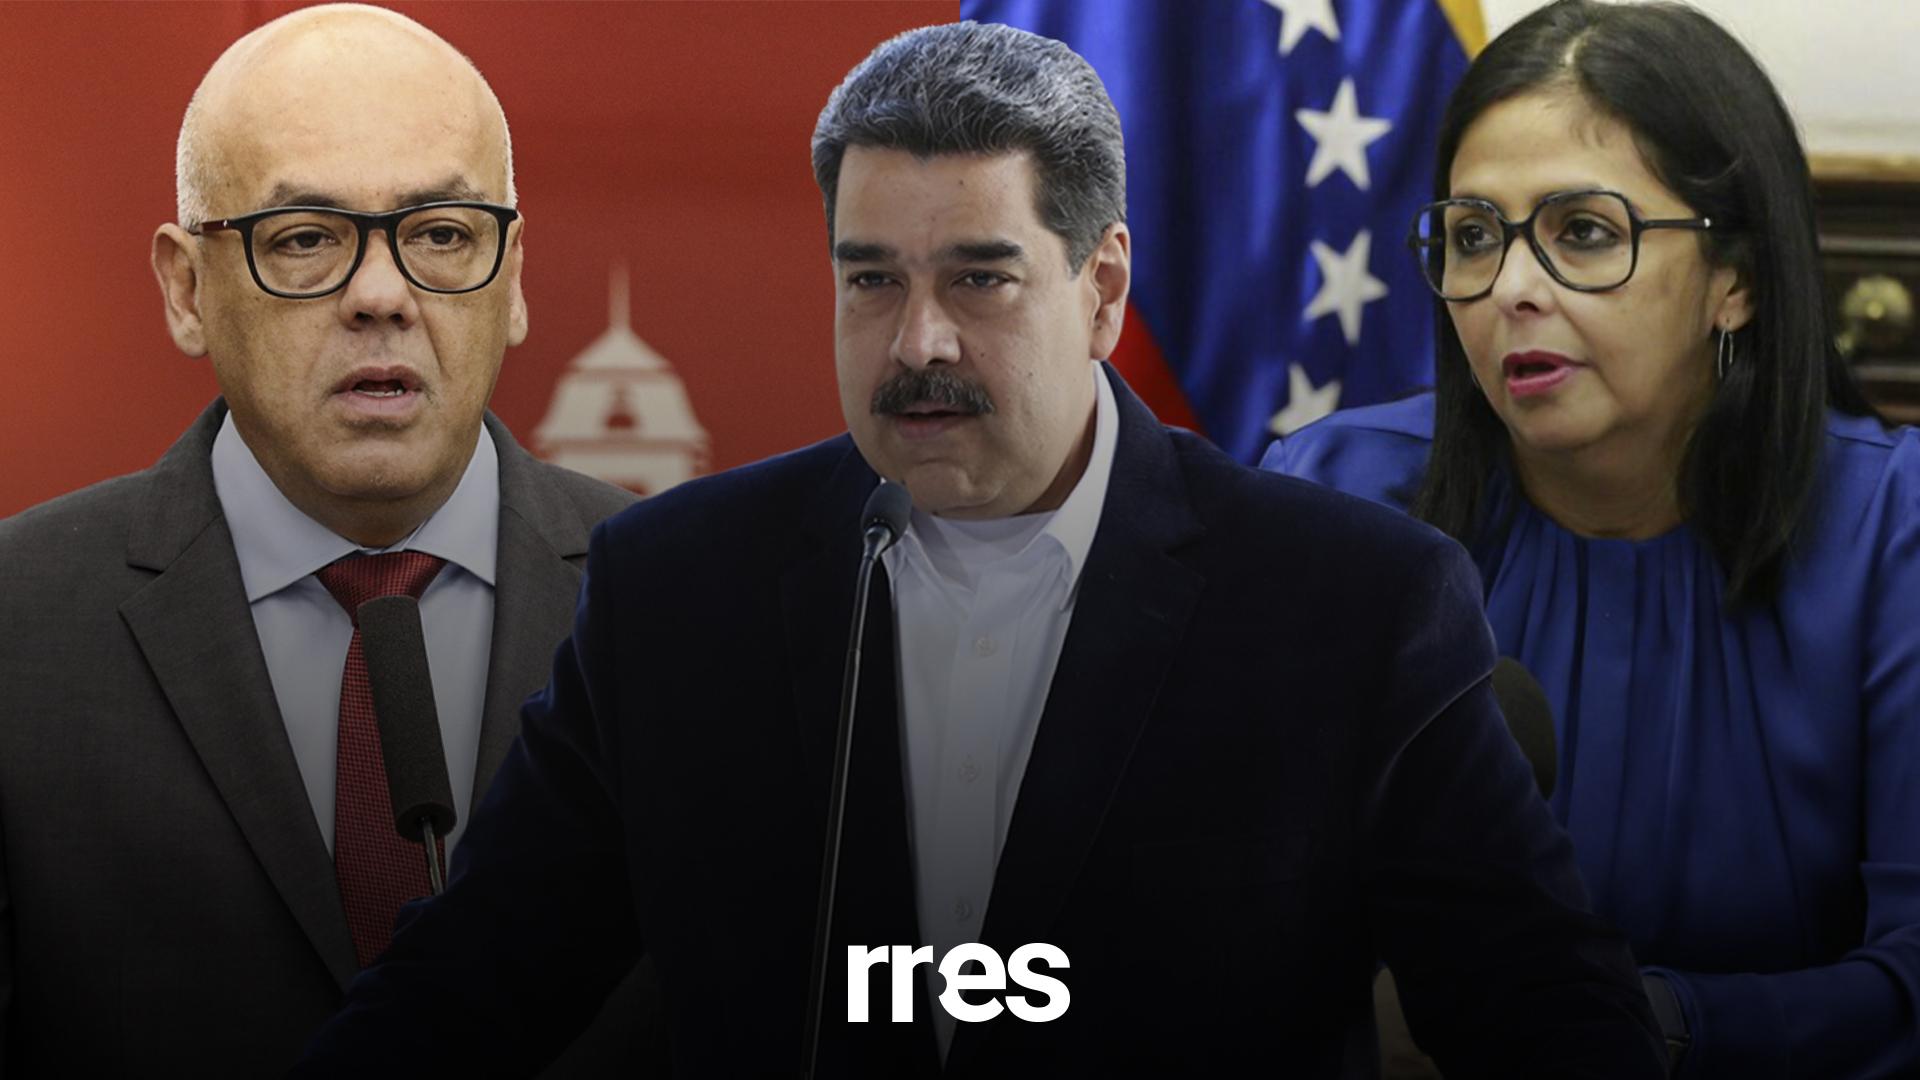 Cifras de coronavirus presentadas por el gobierno de Maduro revelan incongruencias